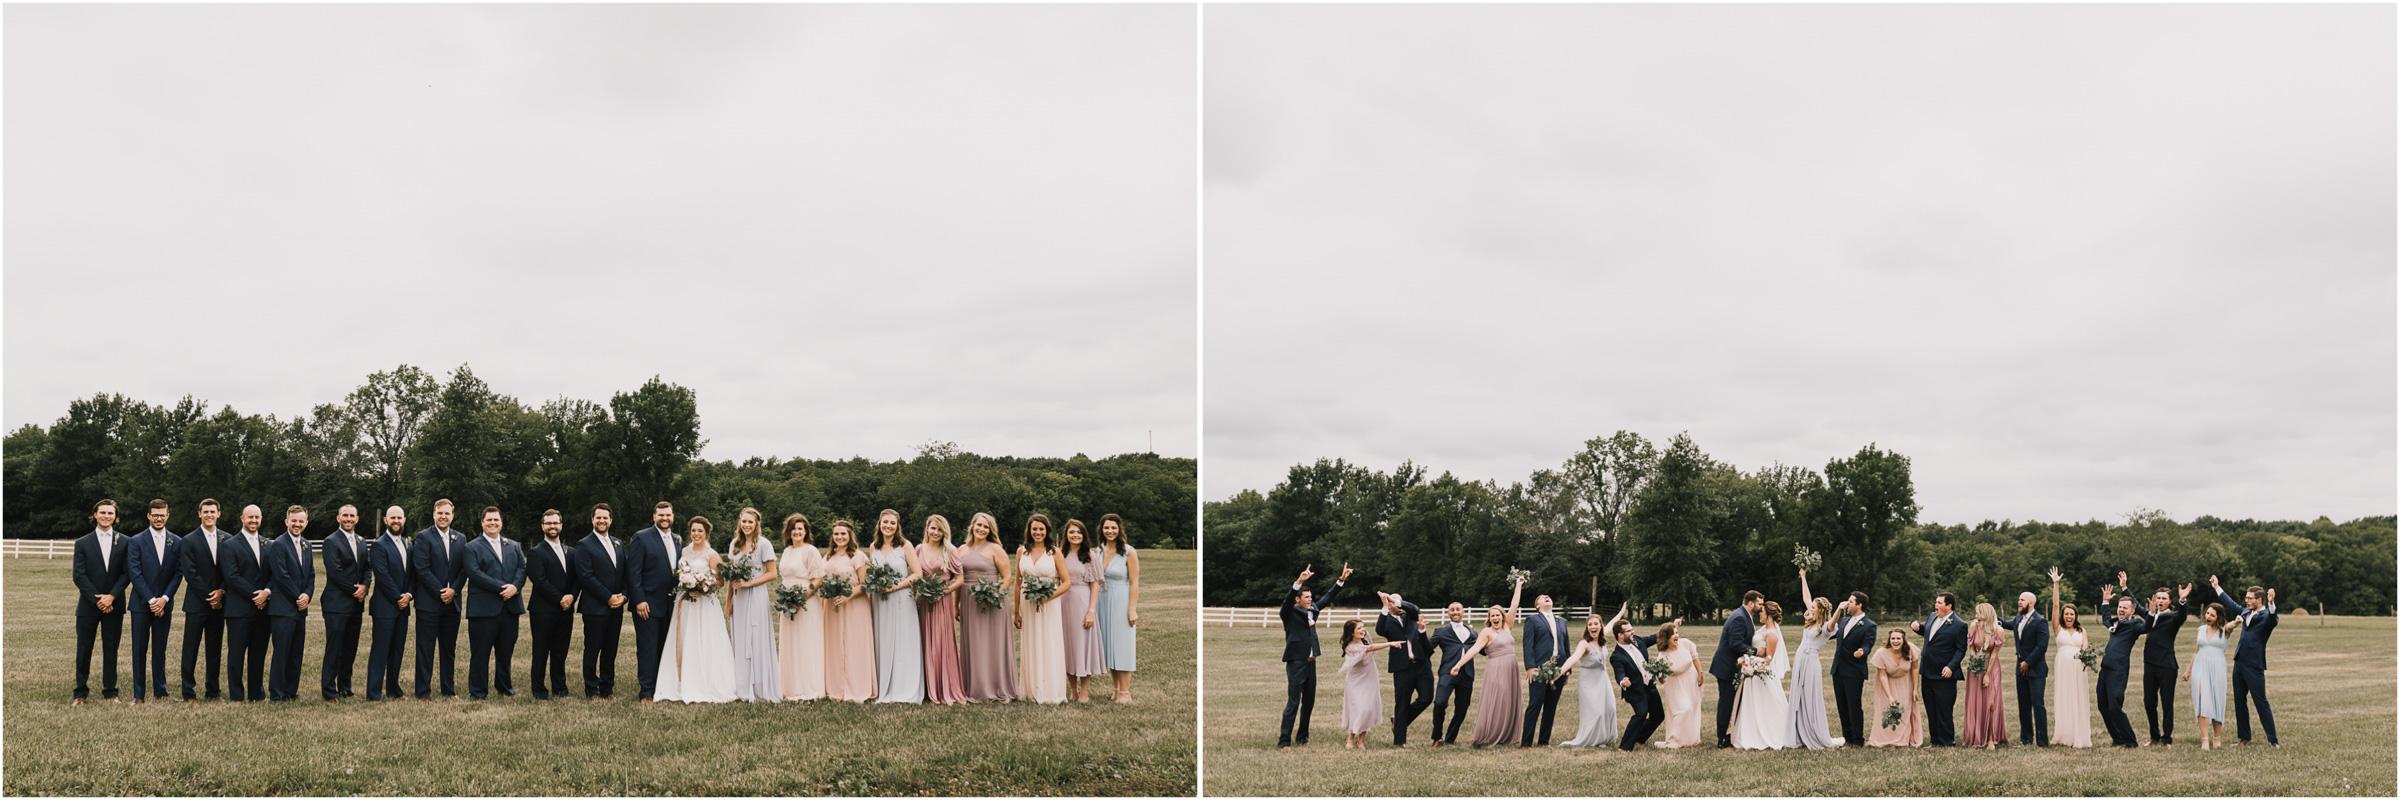 alyssa barletter photography summer odessa missouri wedding kansas city photographer-25.jpg